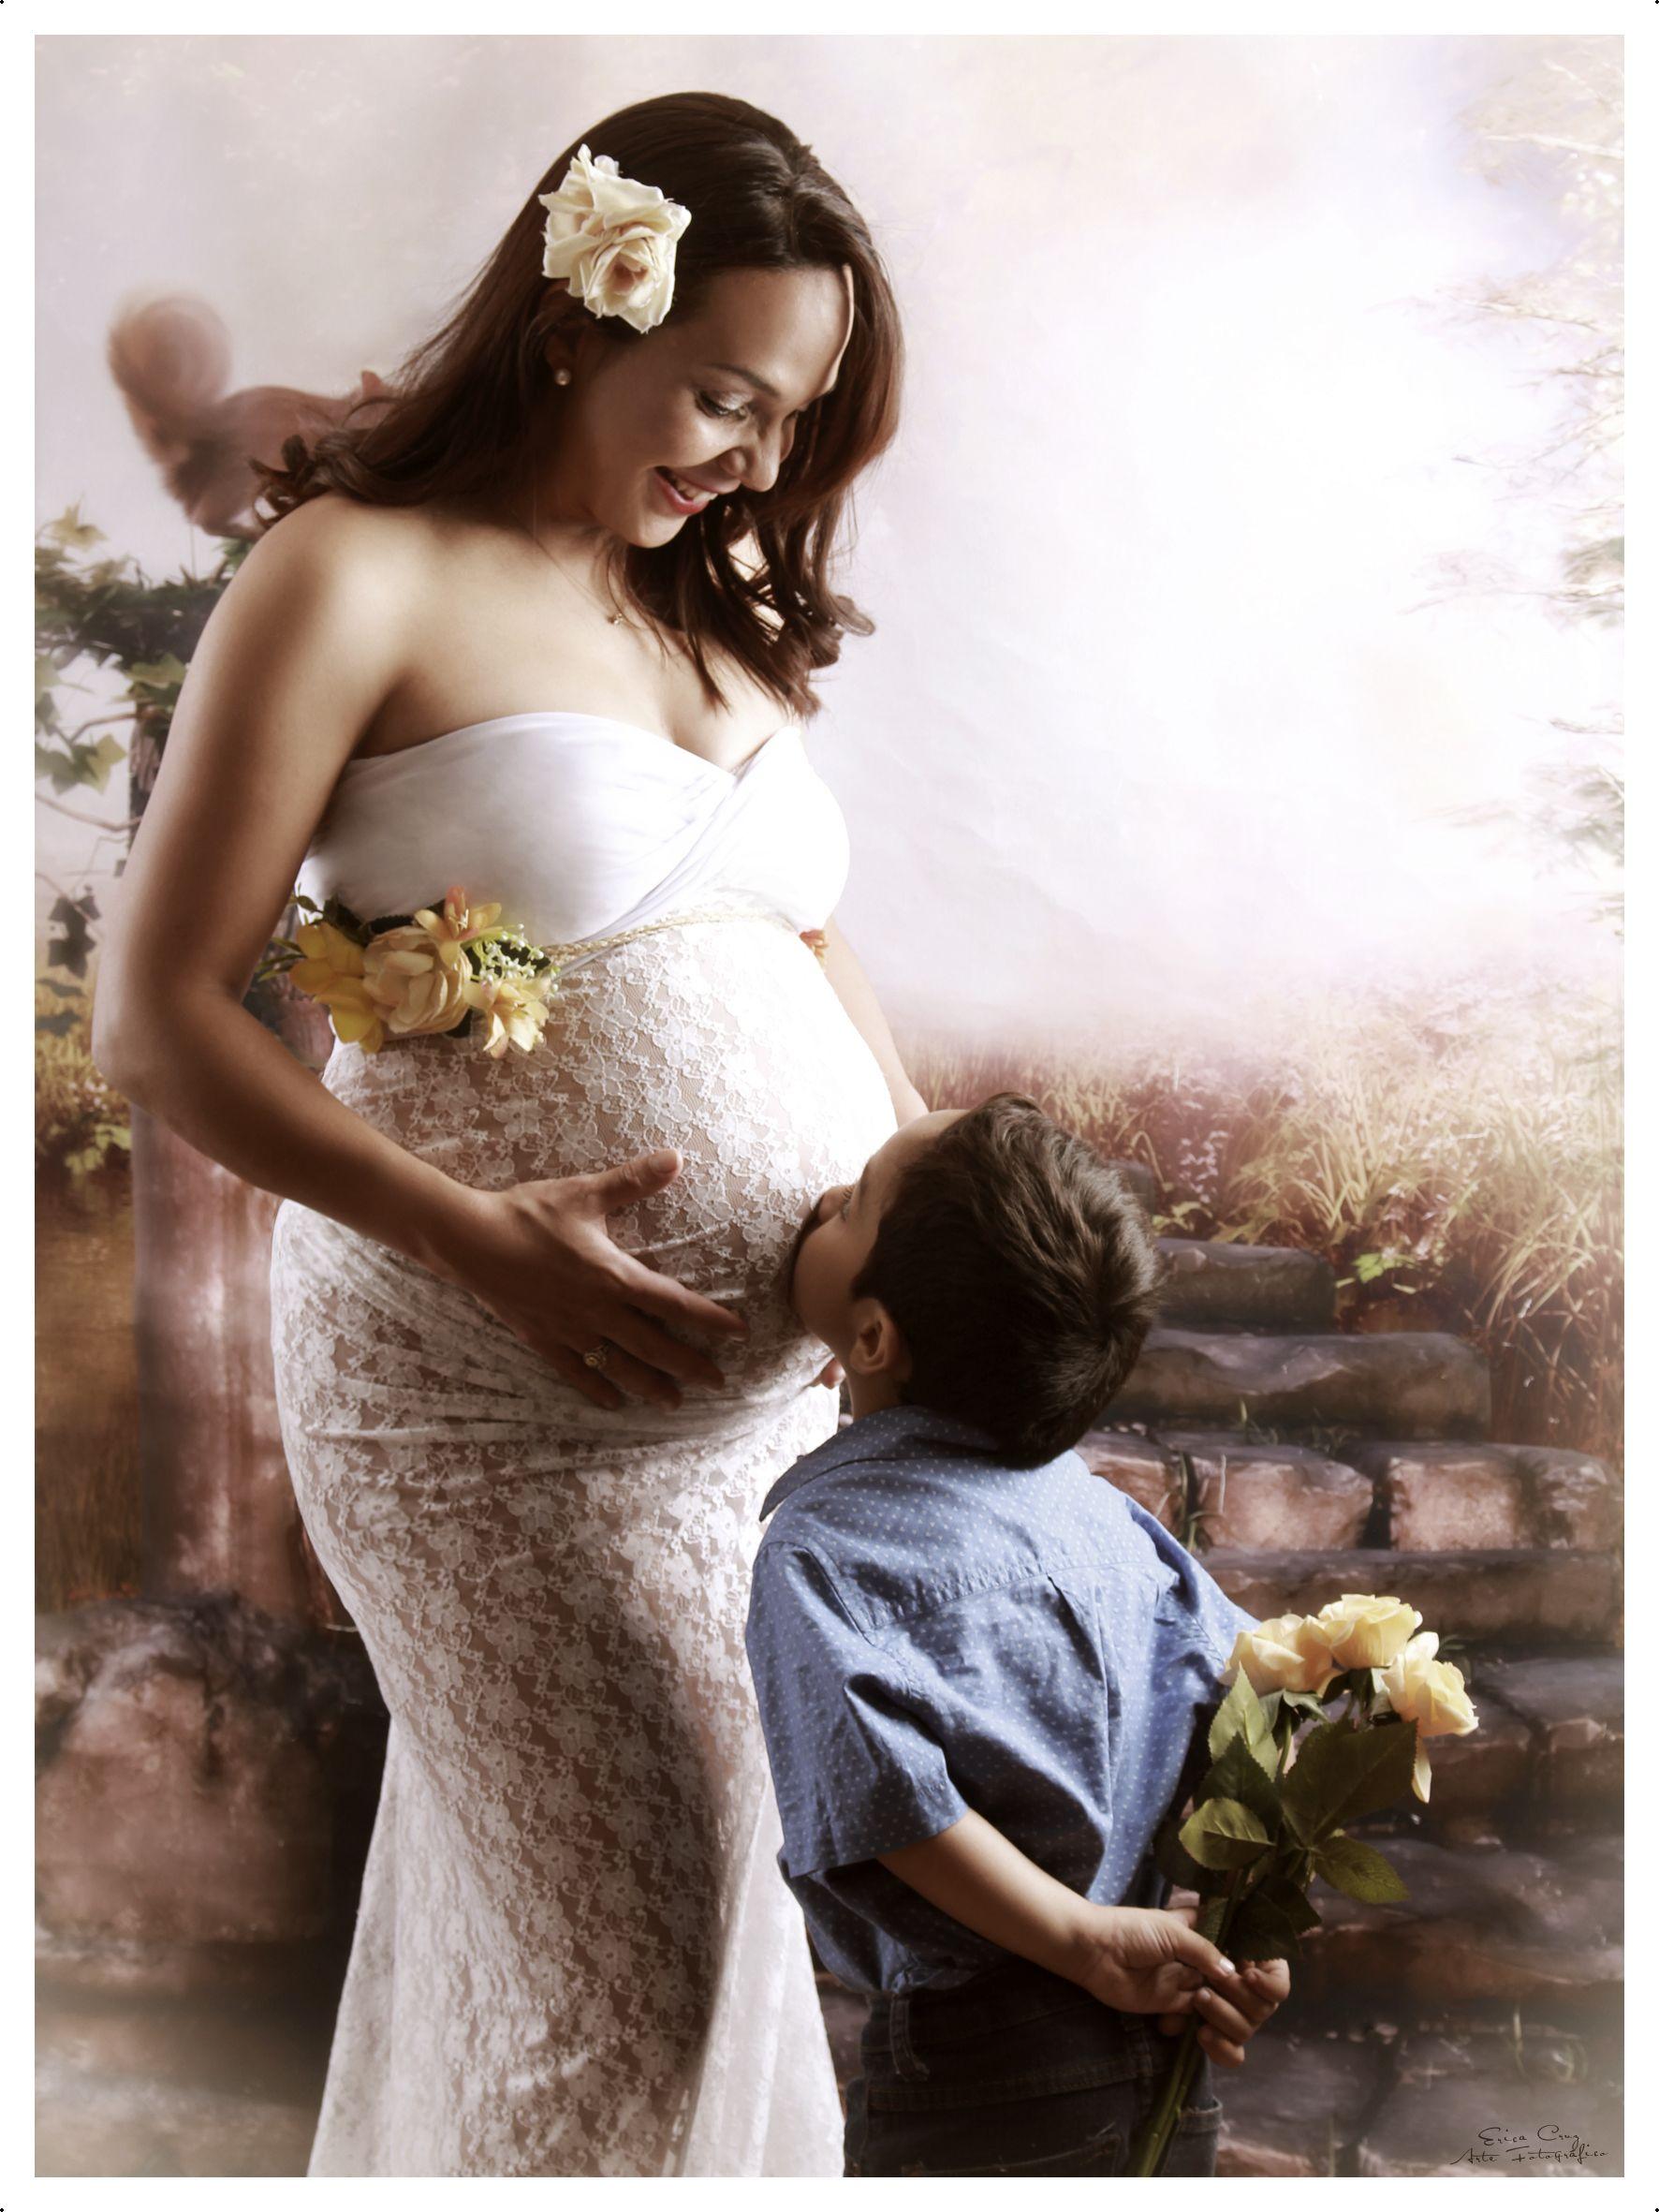 Pin On Maternidad